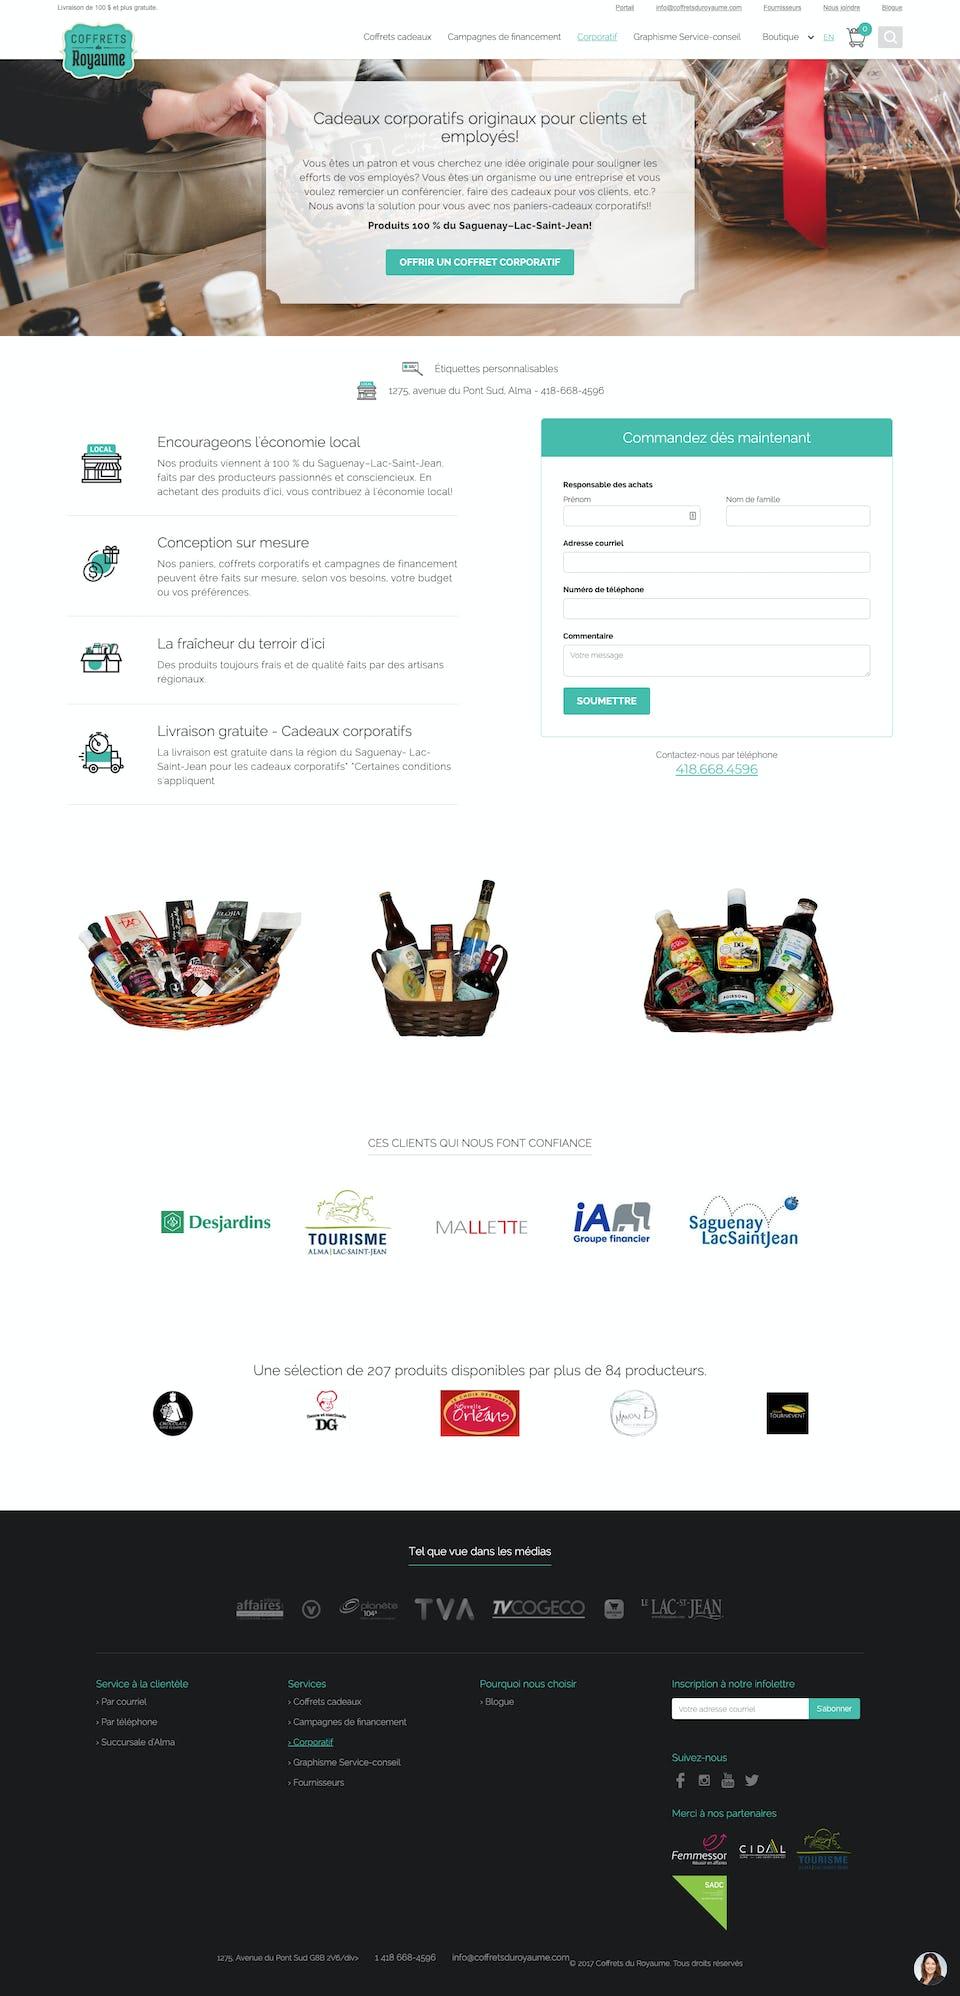 webflow project 3 - Coffrets du Royaume